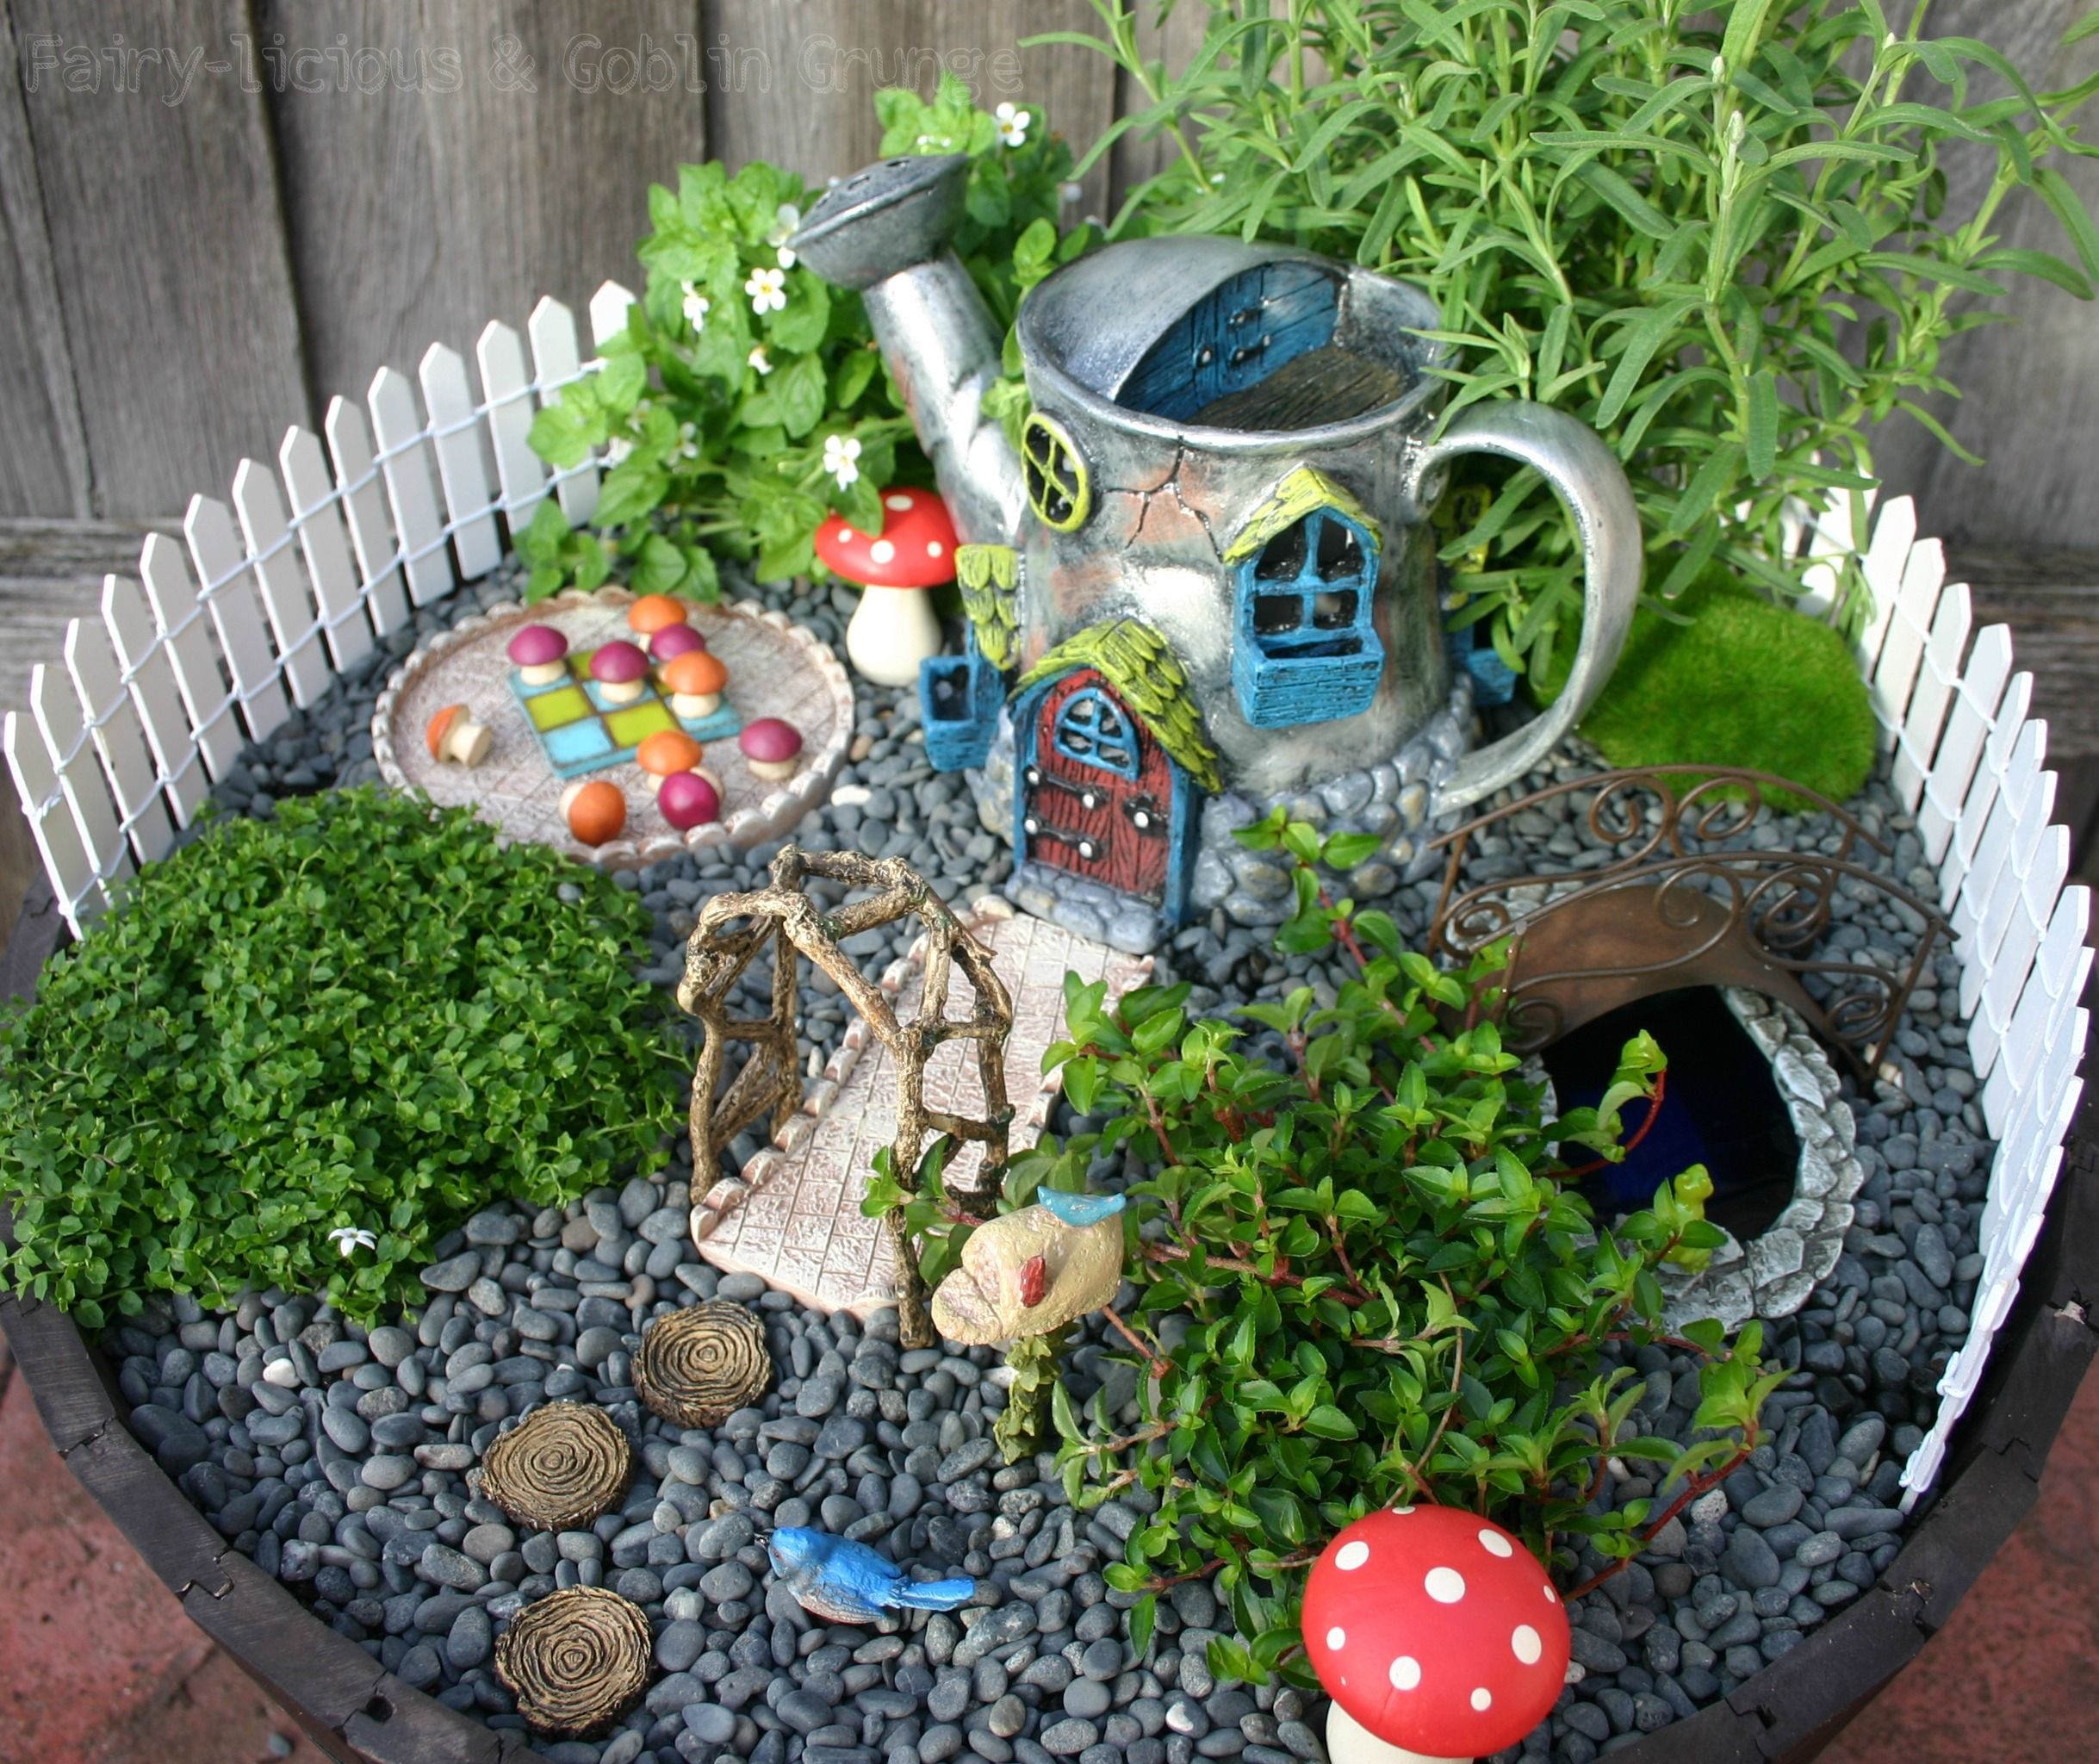 Fairy Garden Landscape Design ideas in 2016 fairy front garden 26 cool 680x453 tags fairy garden design ideas 78 Bsta Bilder Om Fairy Garden P Pinterest Fetrdgrdar